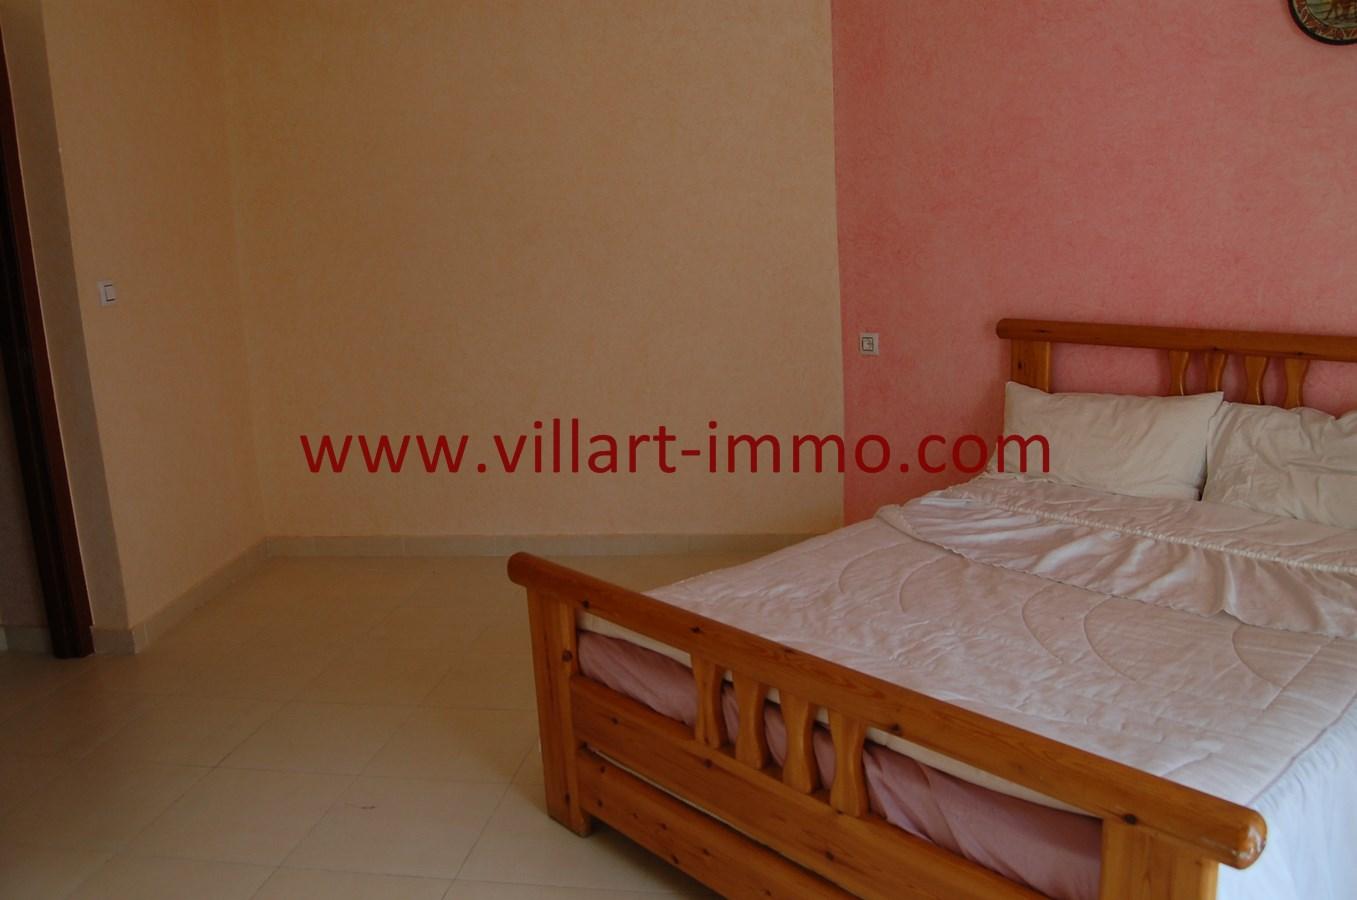 3-Vente-Appartement-Tanger-Malabata-Chambre-VA486-Villart Immo